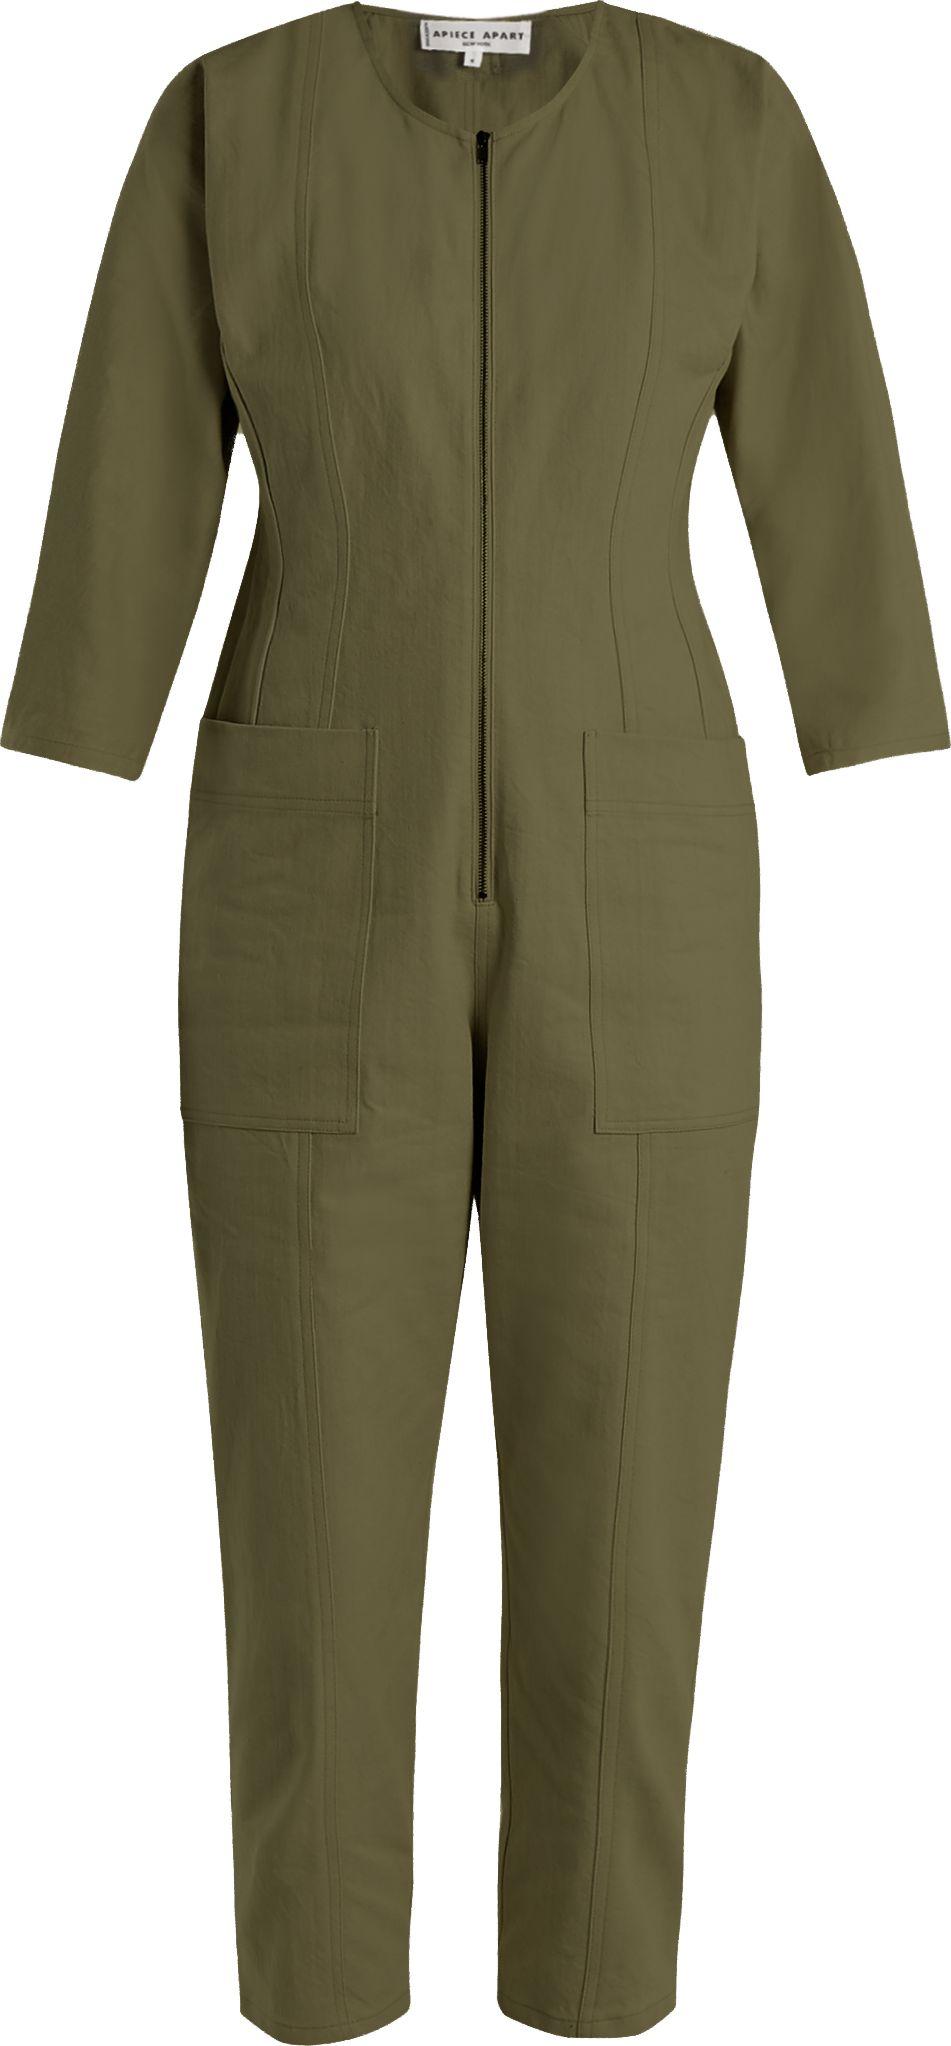 0a64cc13985 APIECE APART Flame Thrower straight-leg denim jumpsuit - Mkt